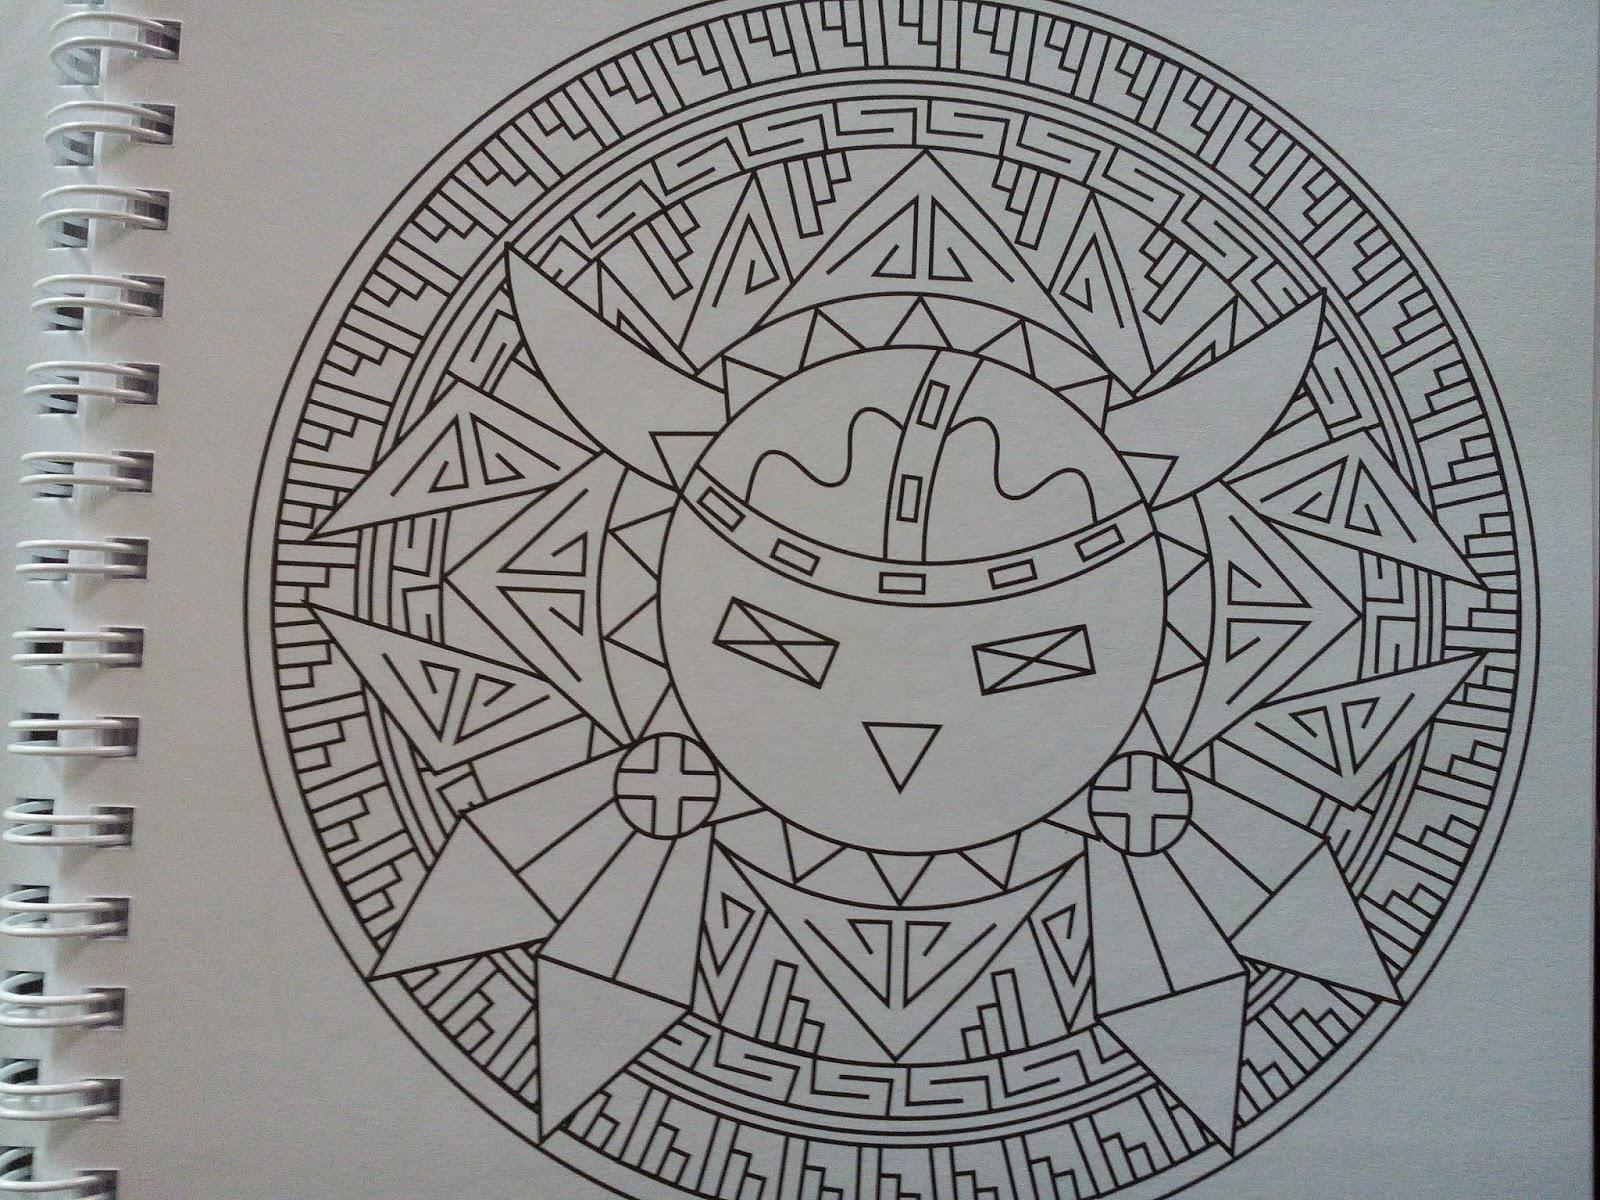 Chronique coloriage anti stress Mandalas navajos et Mandalas du Maroc ♥ ♥ ♥